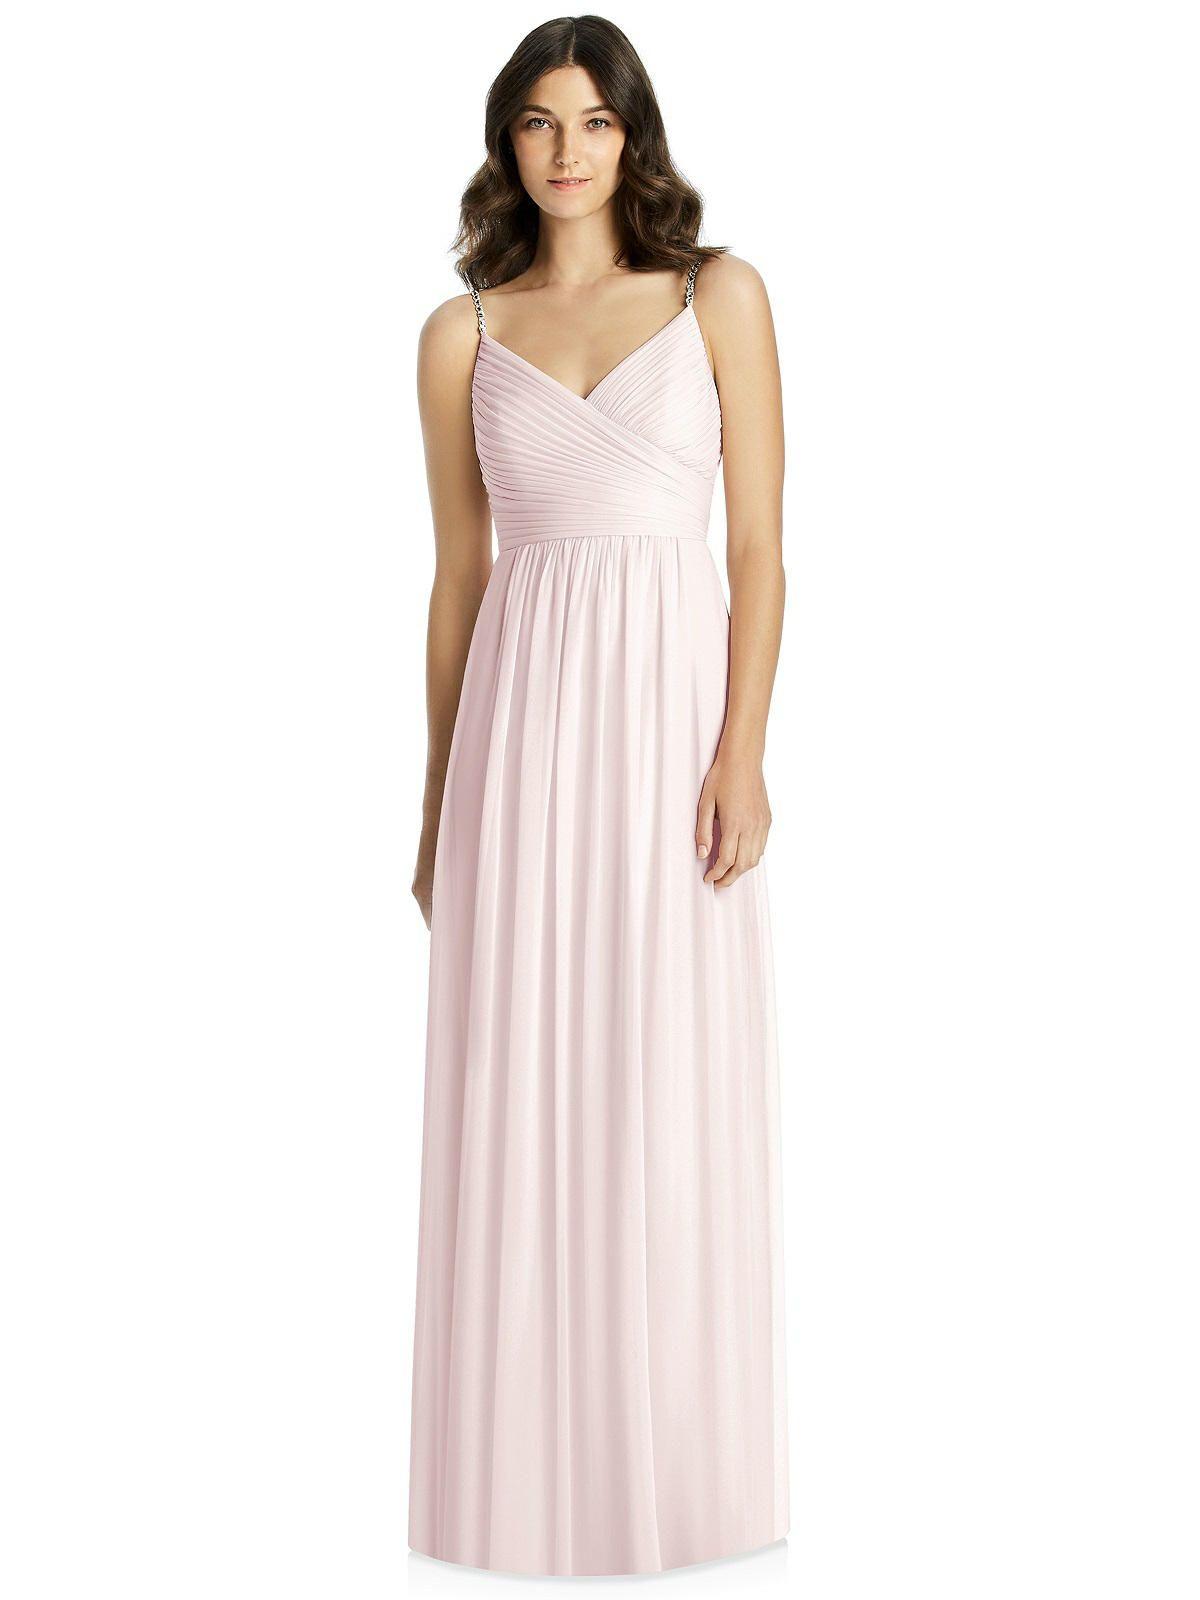 803ddcbce8e Jenny Packham Bridesmaid Dress JP1022 in 2019